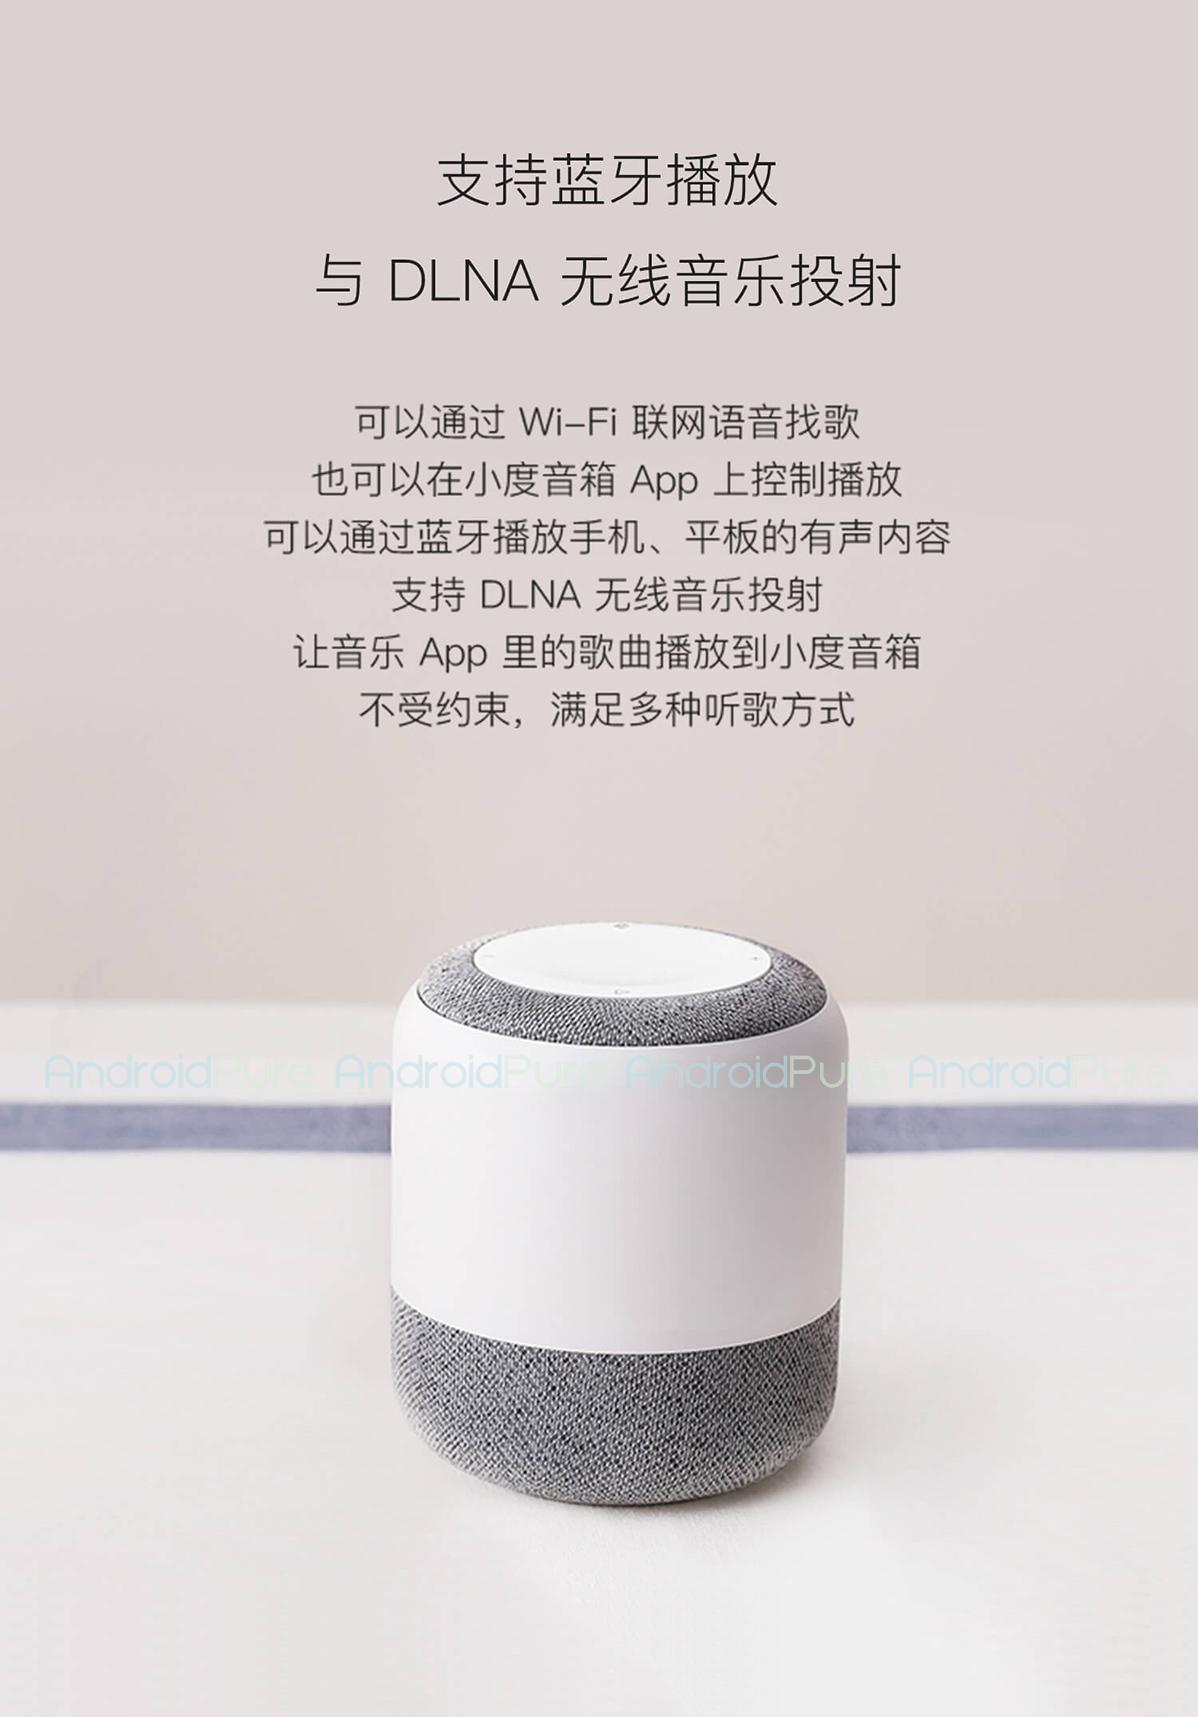 Moto AI Speakers Amazon Echo3 All about Motorola AI Assistant speakers, like Amazon Echo or Google Mini [Updated] 7